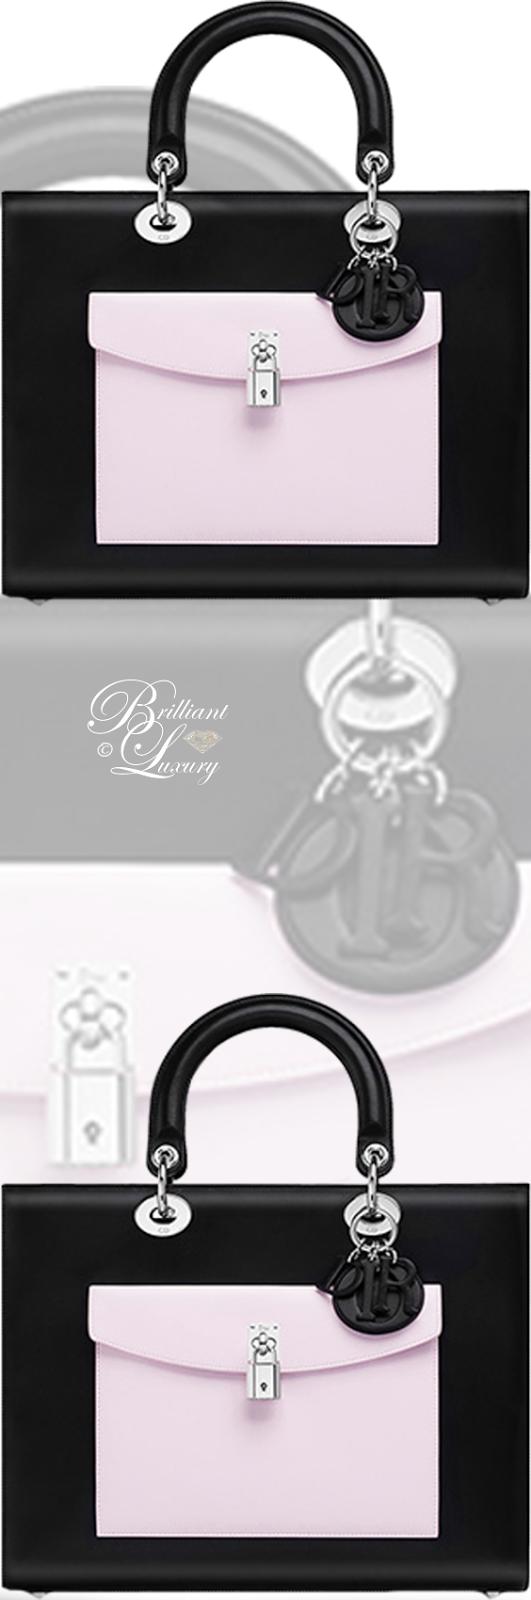 Brilliant Luxury ♦ Dior Lady Dior 'Black Lambskin With Contrasting Pockets' Bag